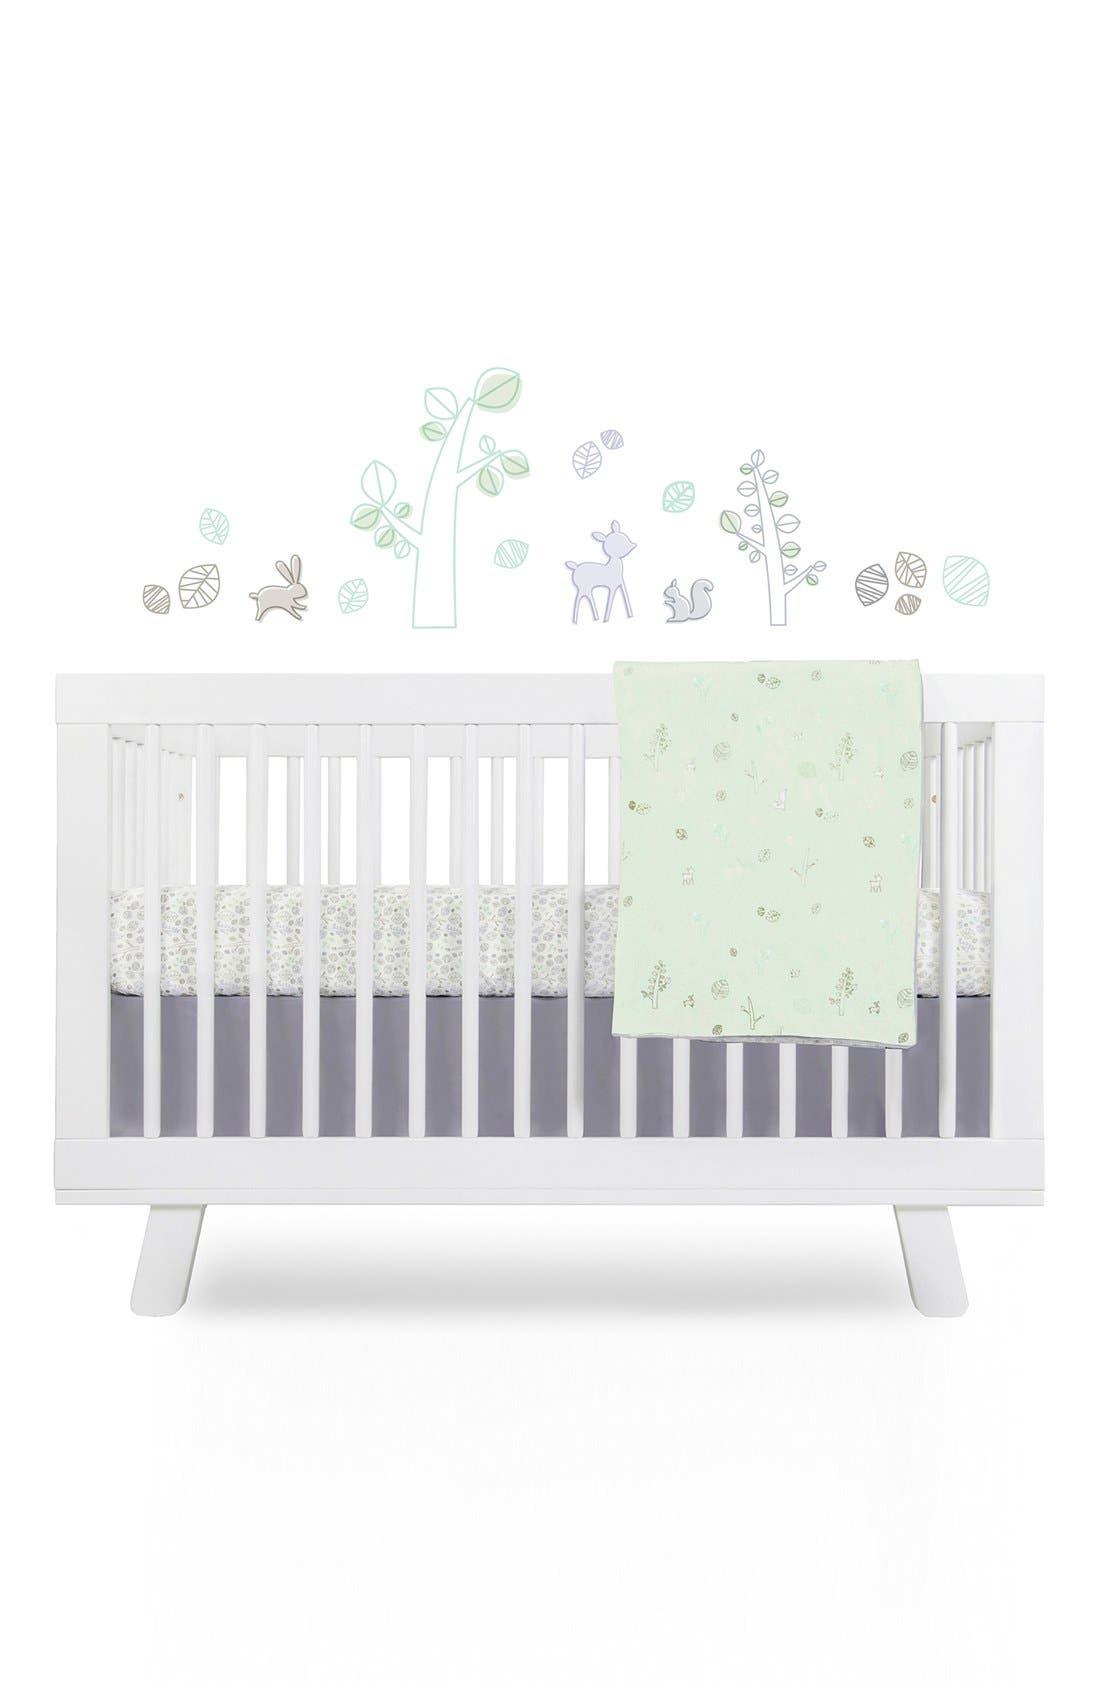 BABYLETTO 'Woods' Crib Sheet, Crib Skirt, Contour Changing